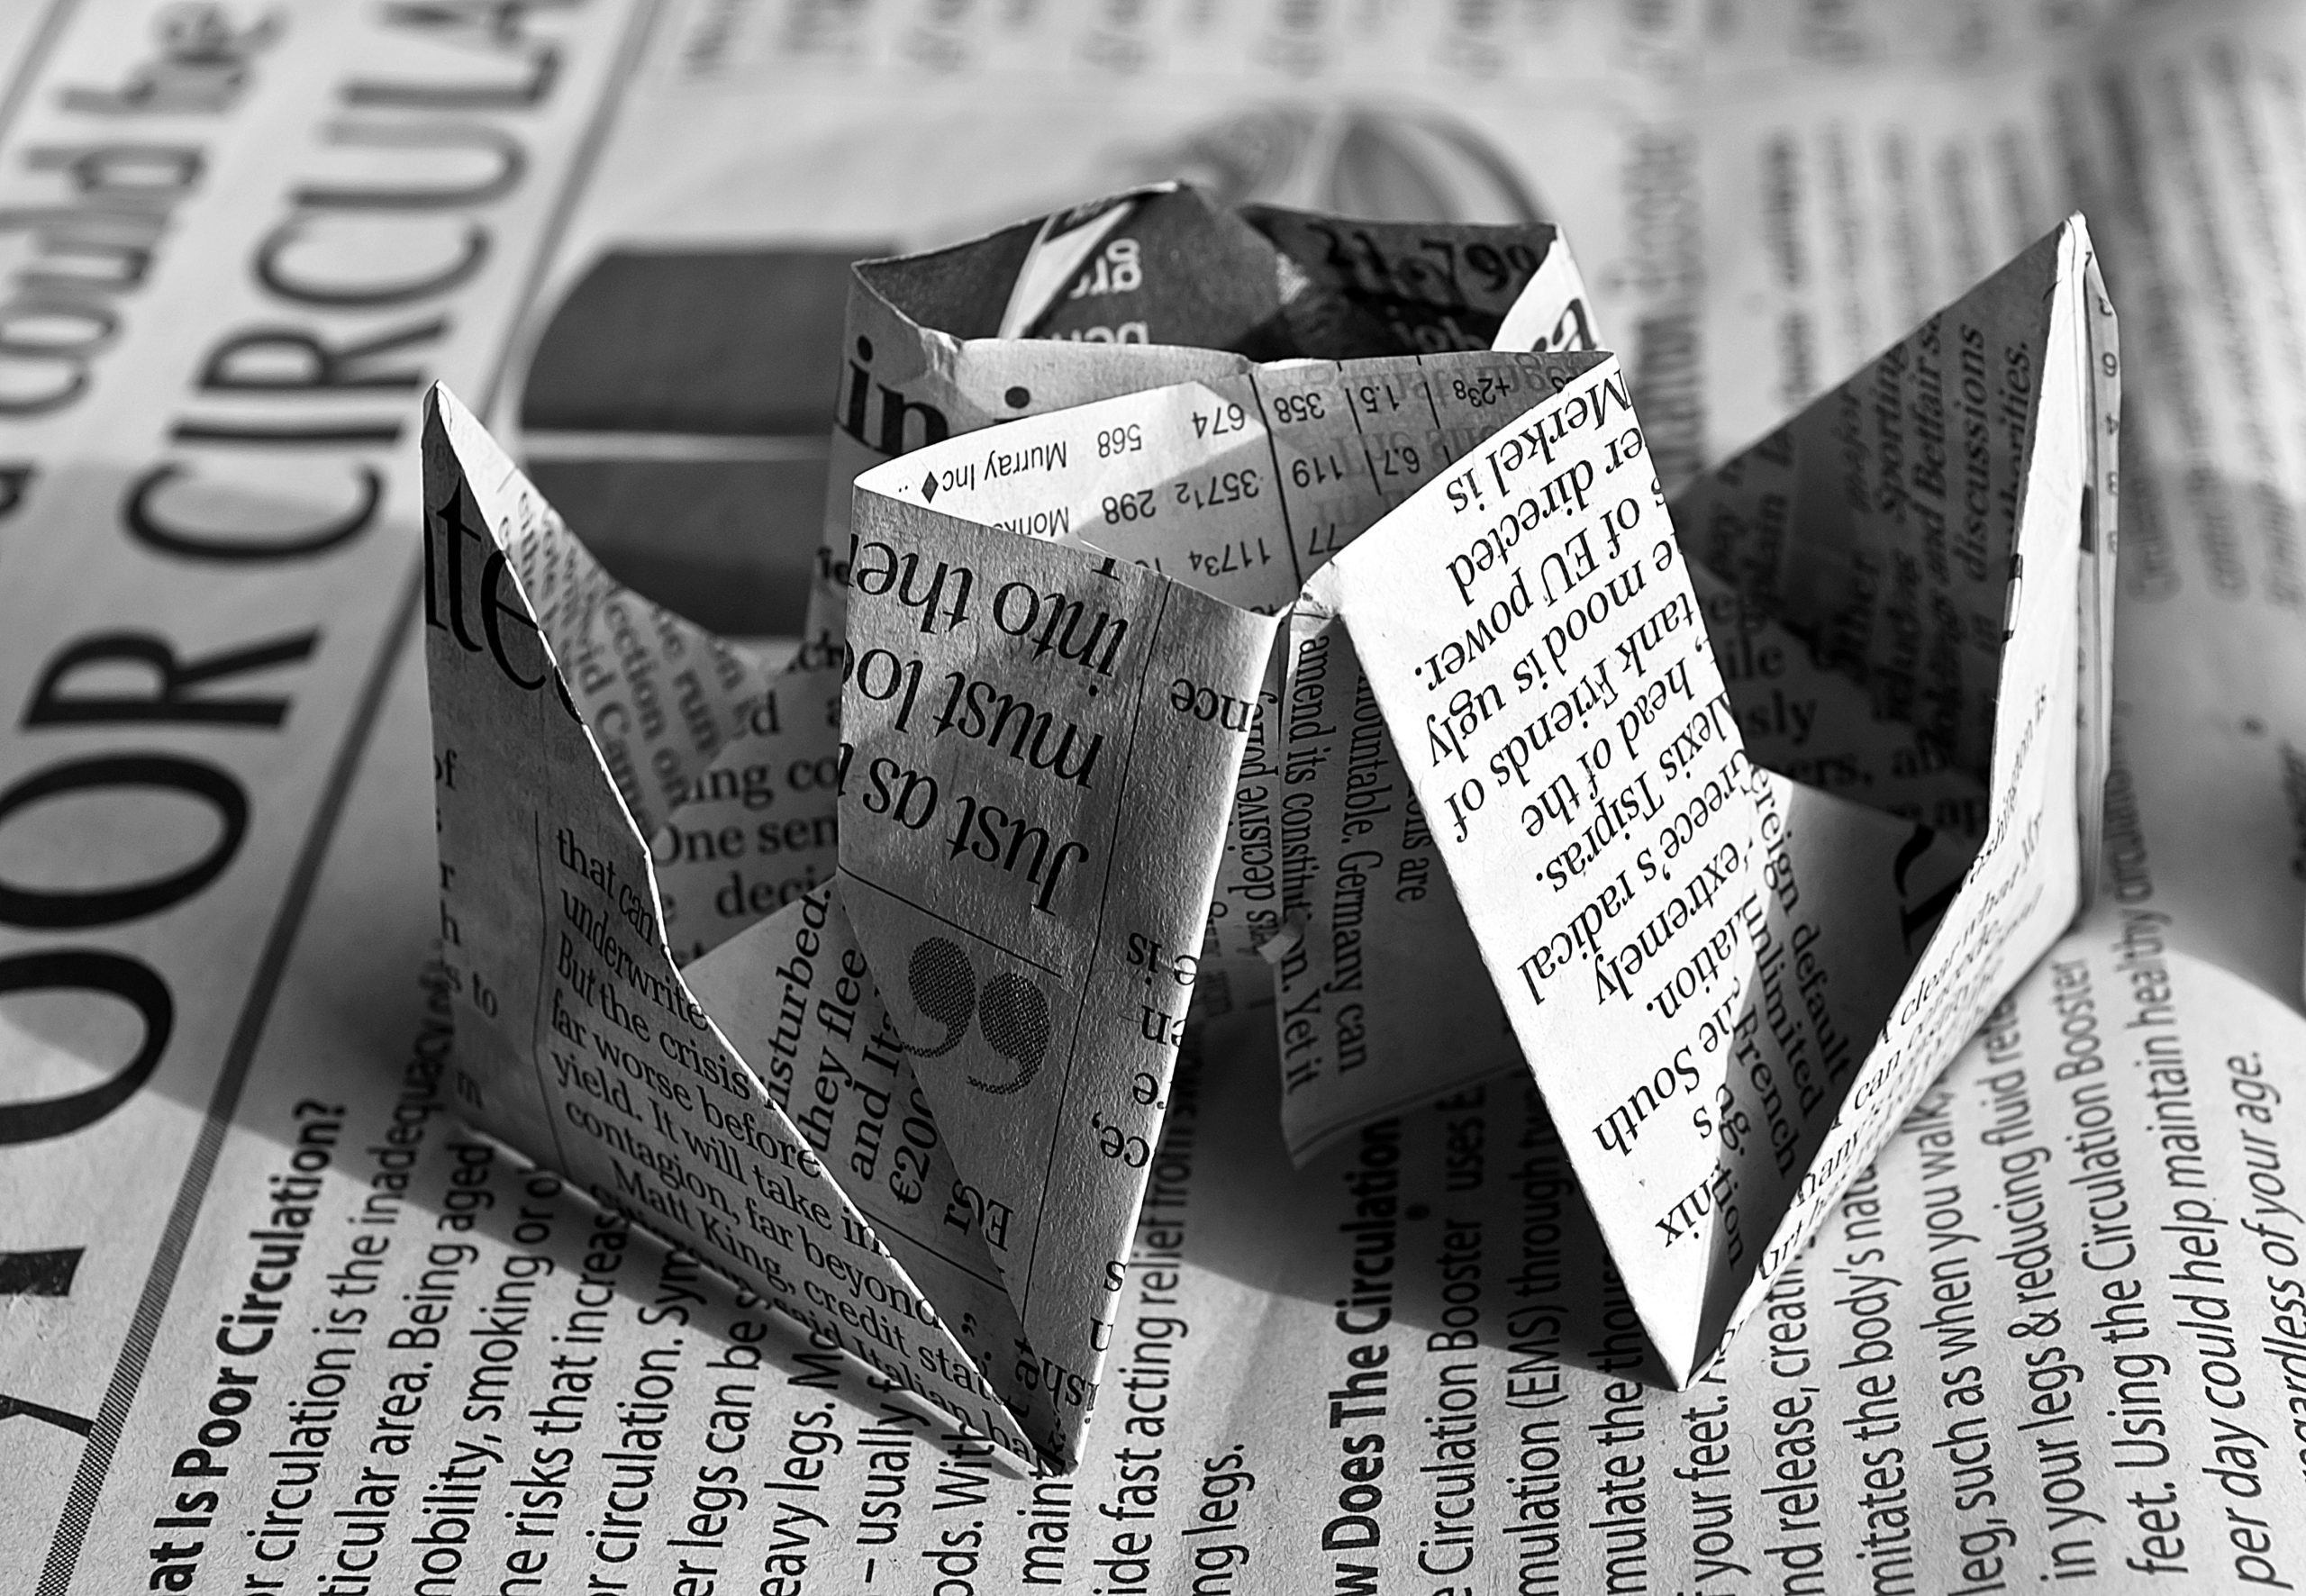 Newspaper folded in an origami fashion